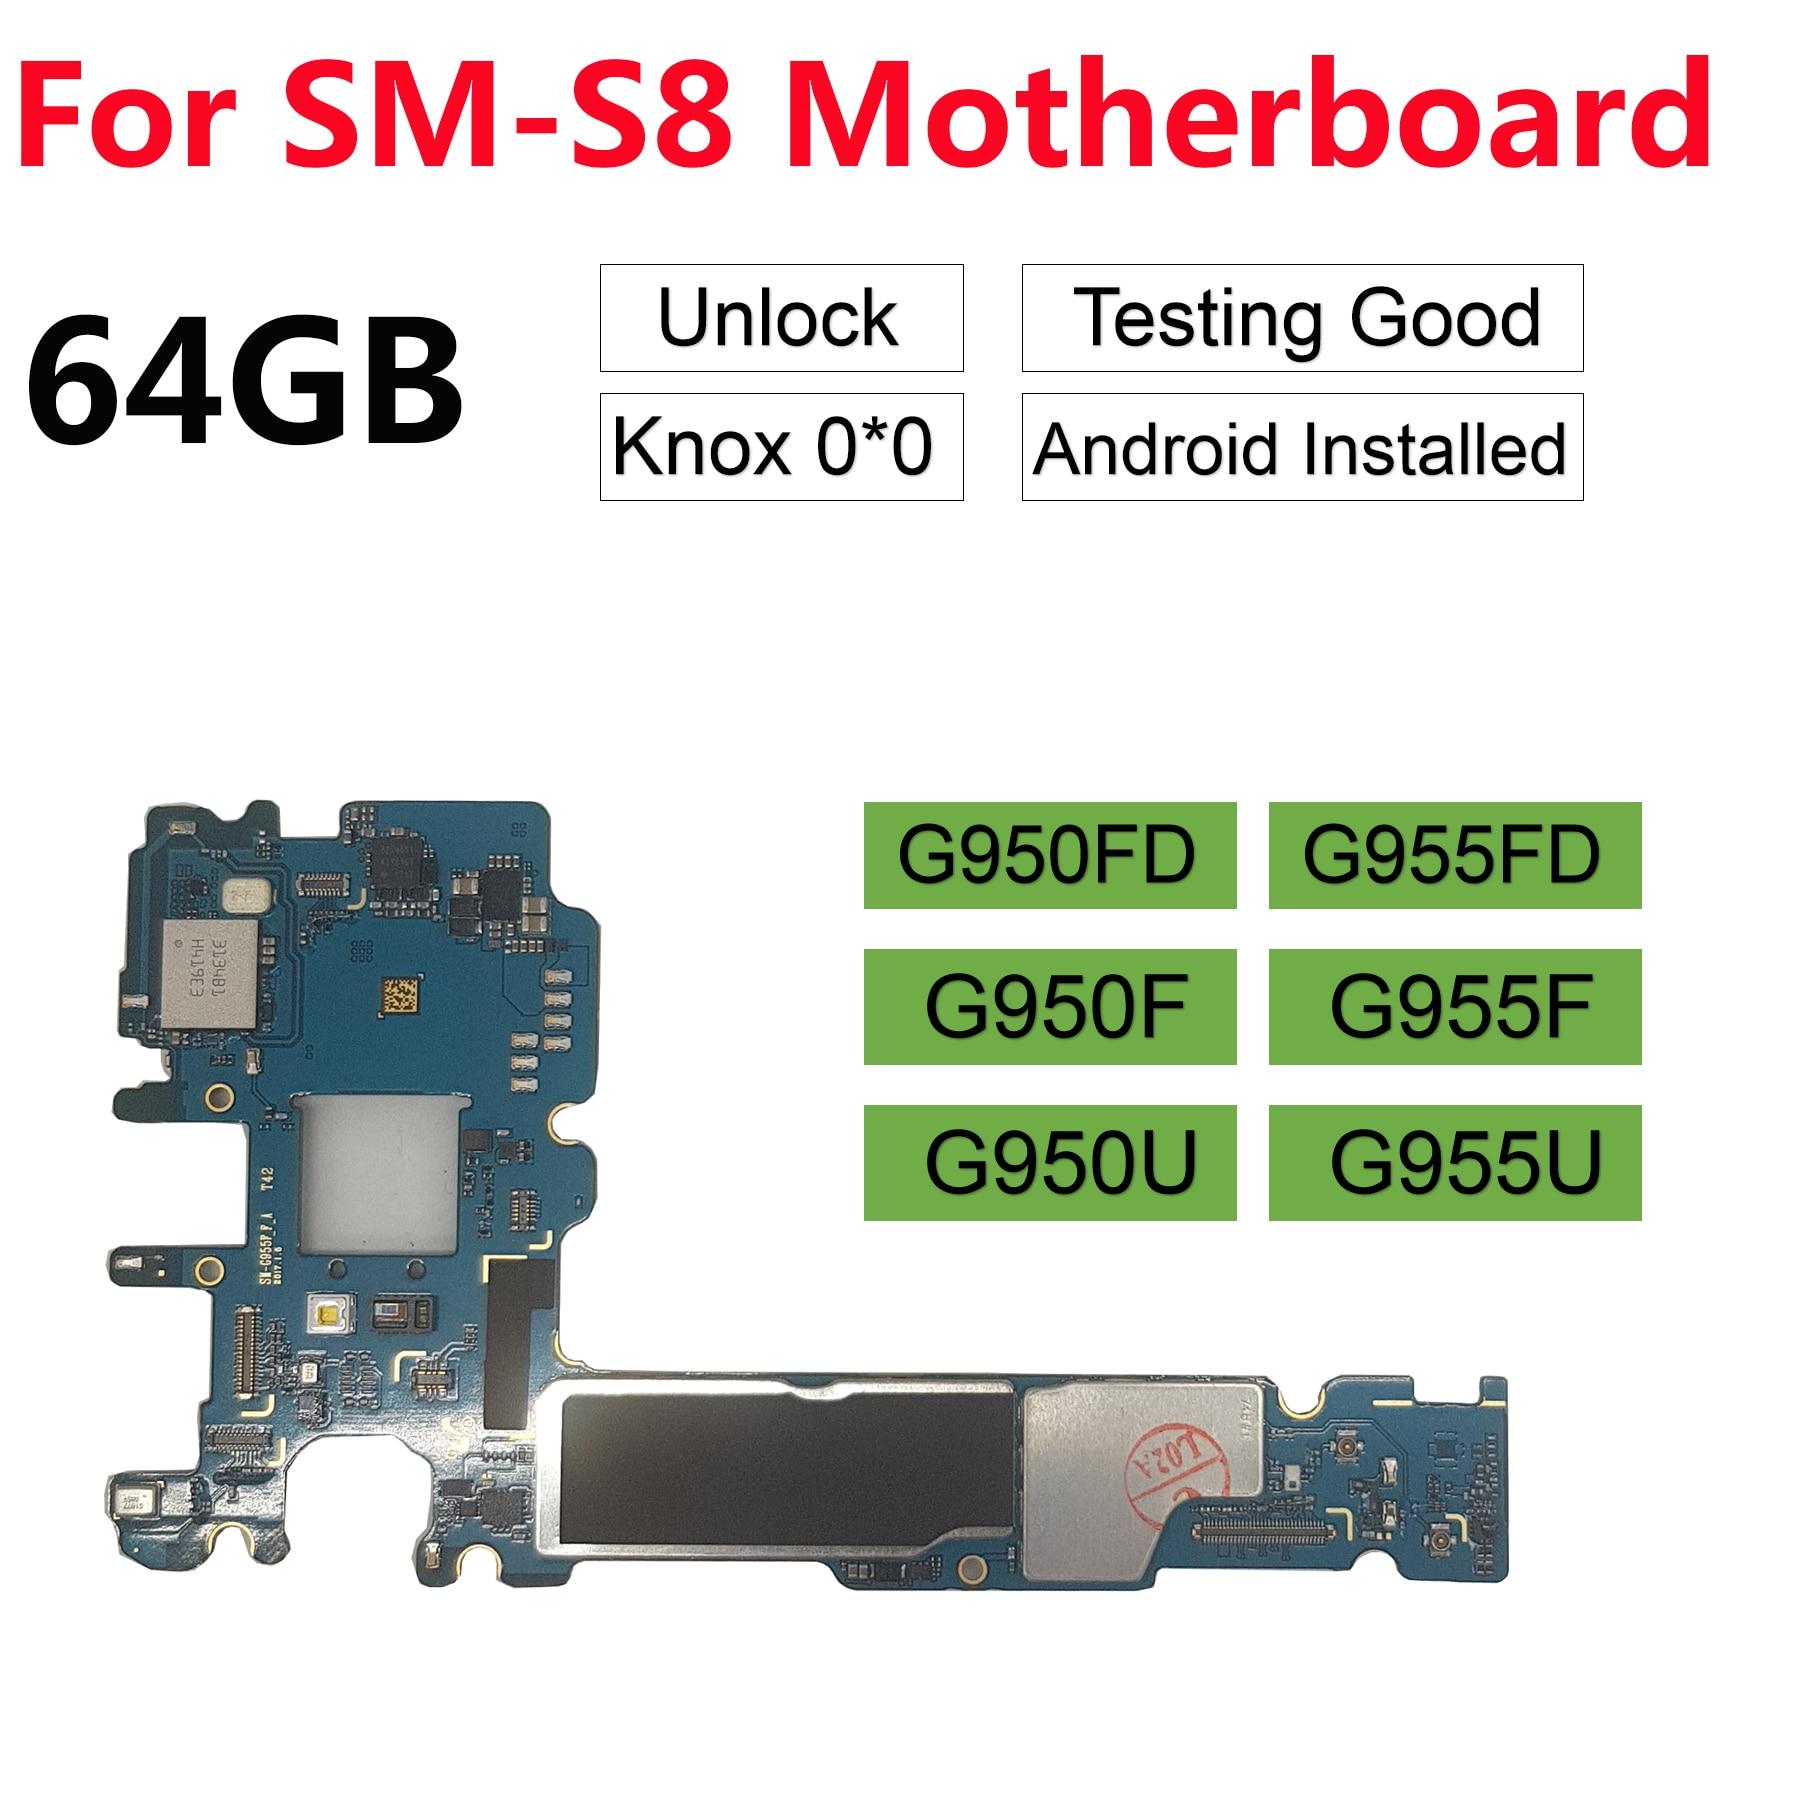 BINYEAE Unlocked Main Motherboard For Samsung Galaxy S8 Plus G955F G955FD S8 G950F G950U G950FD Unlock 64GB Motherboard